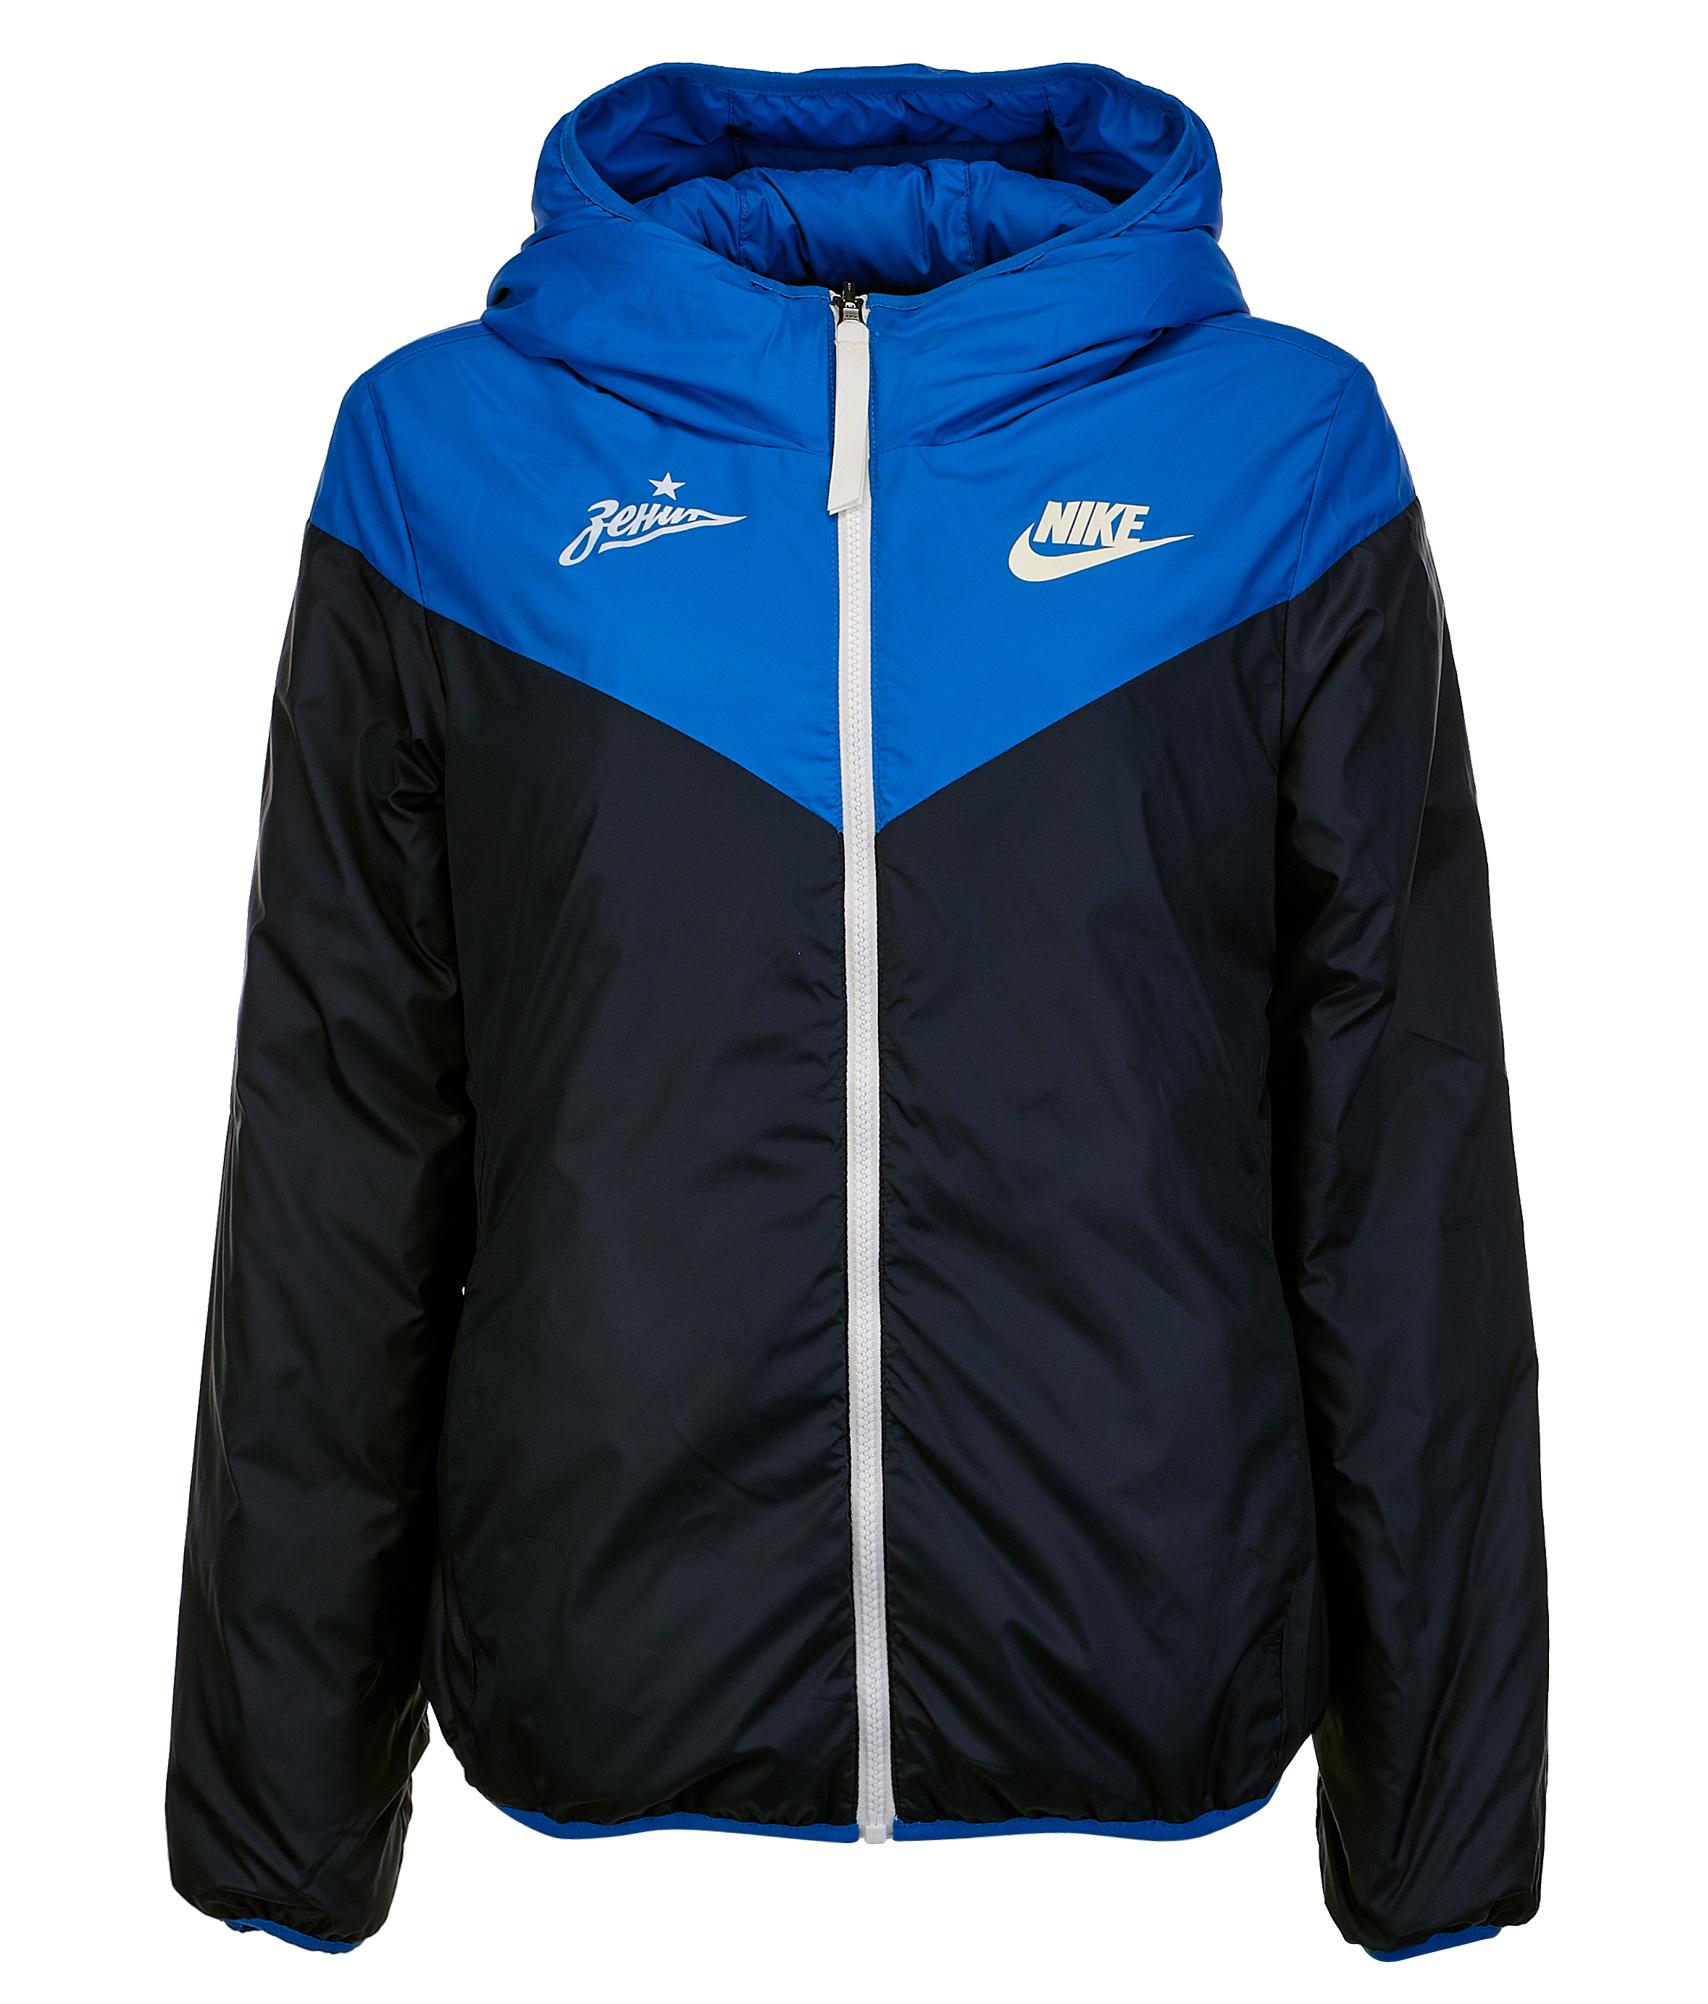 Пуховик двухсторонний женский Nike Nike Цвет-Голубой